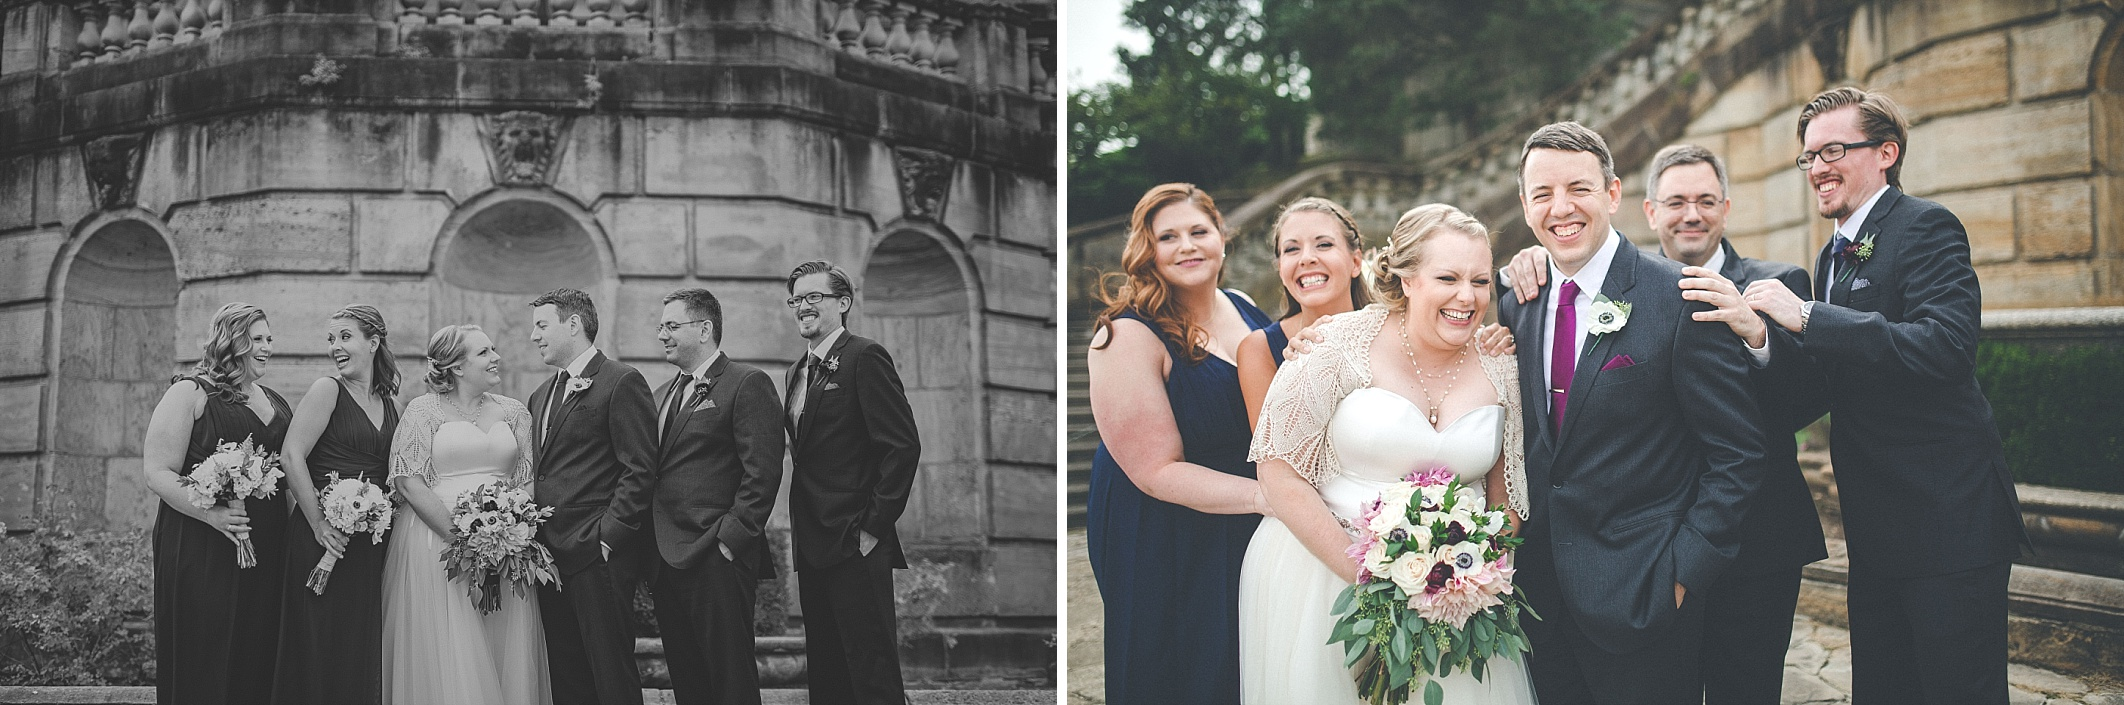 wedding-photographer-dayton-ohio_0008.jpg